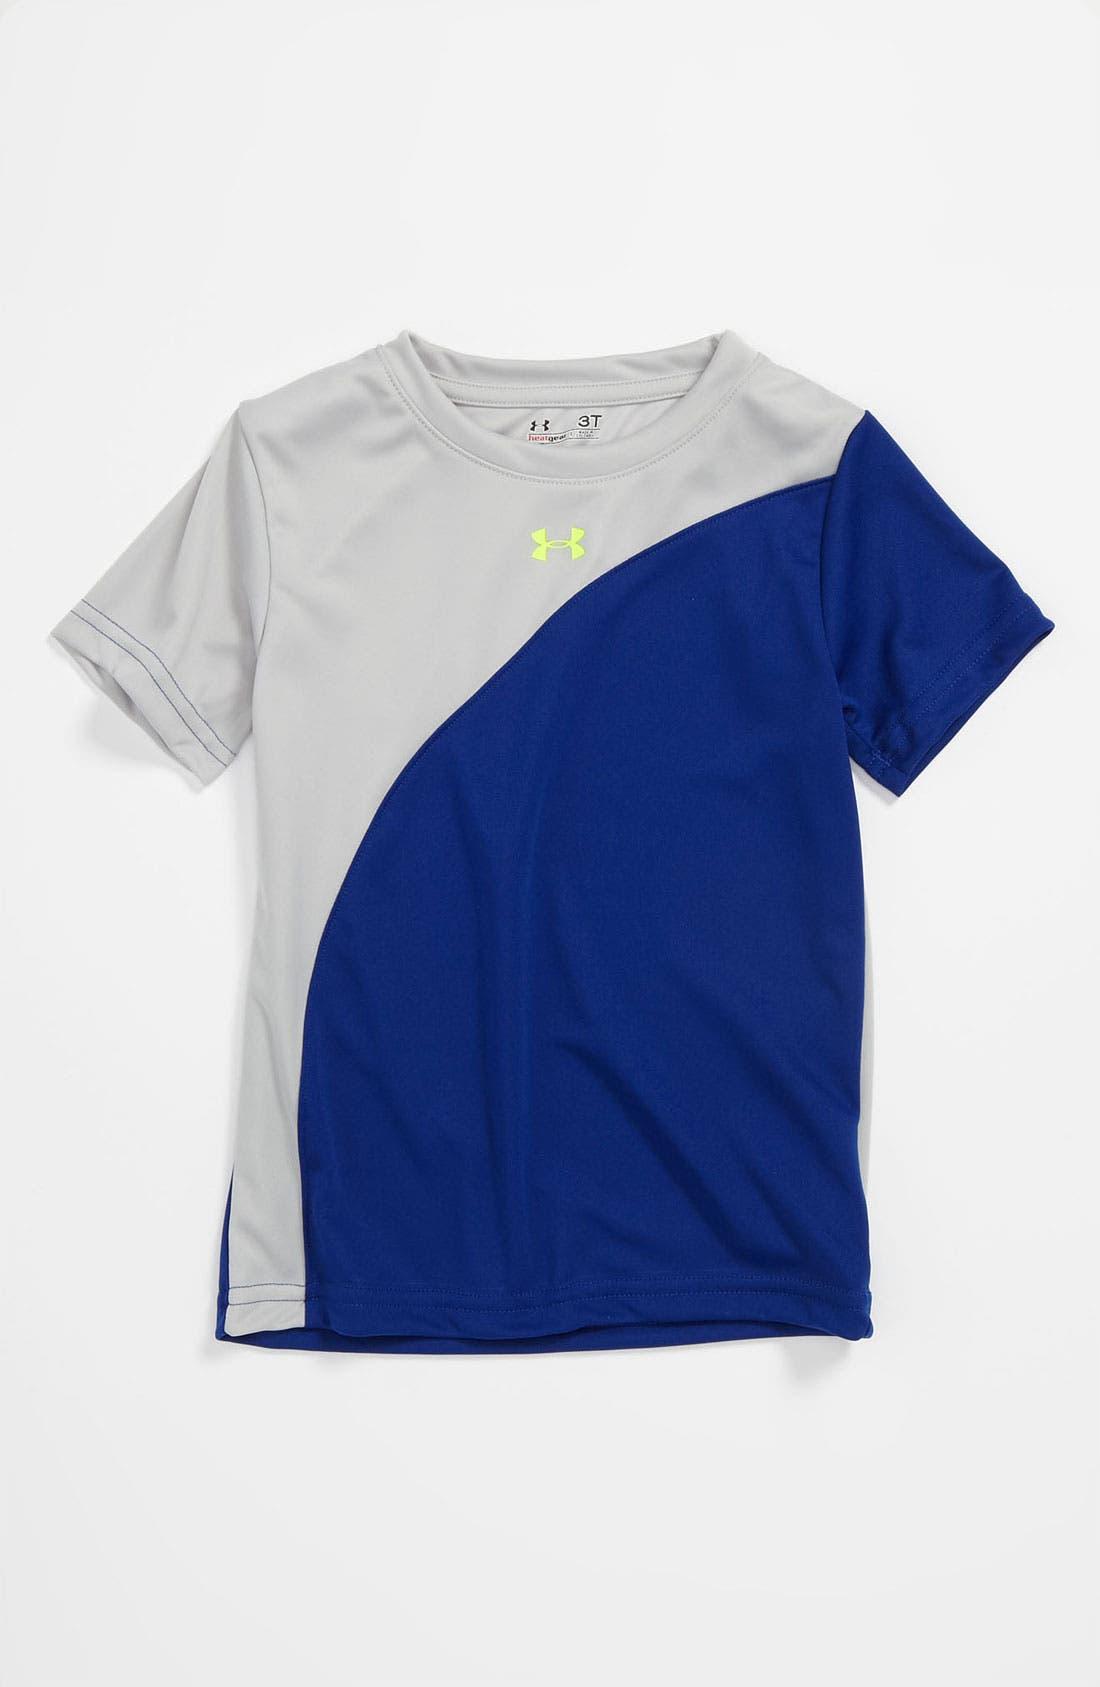 Main Image - Under Armour T-Shirt (Toddler)